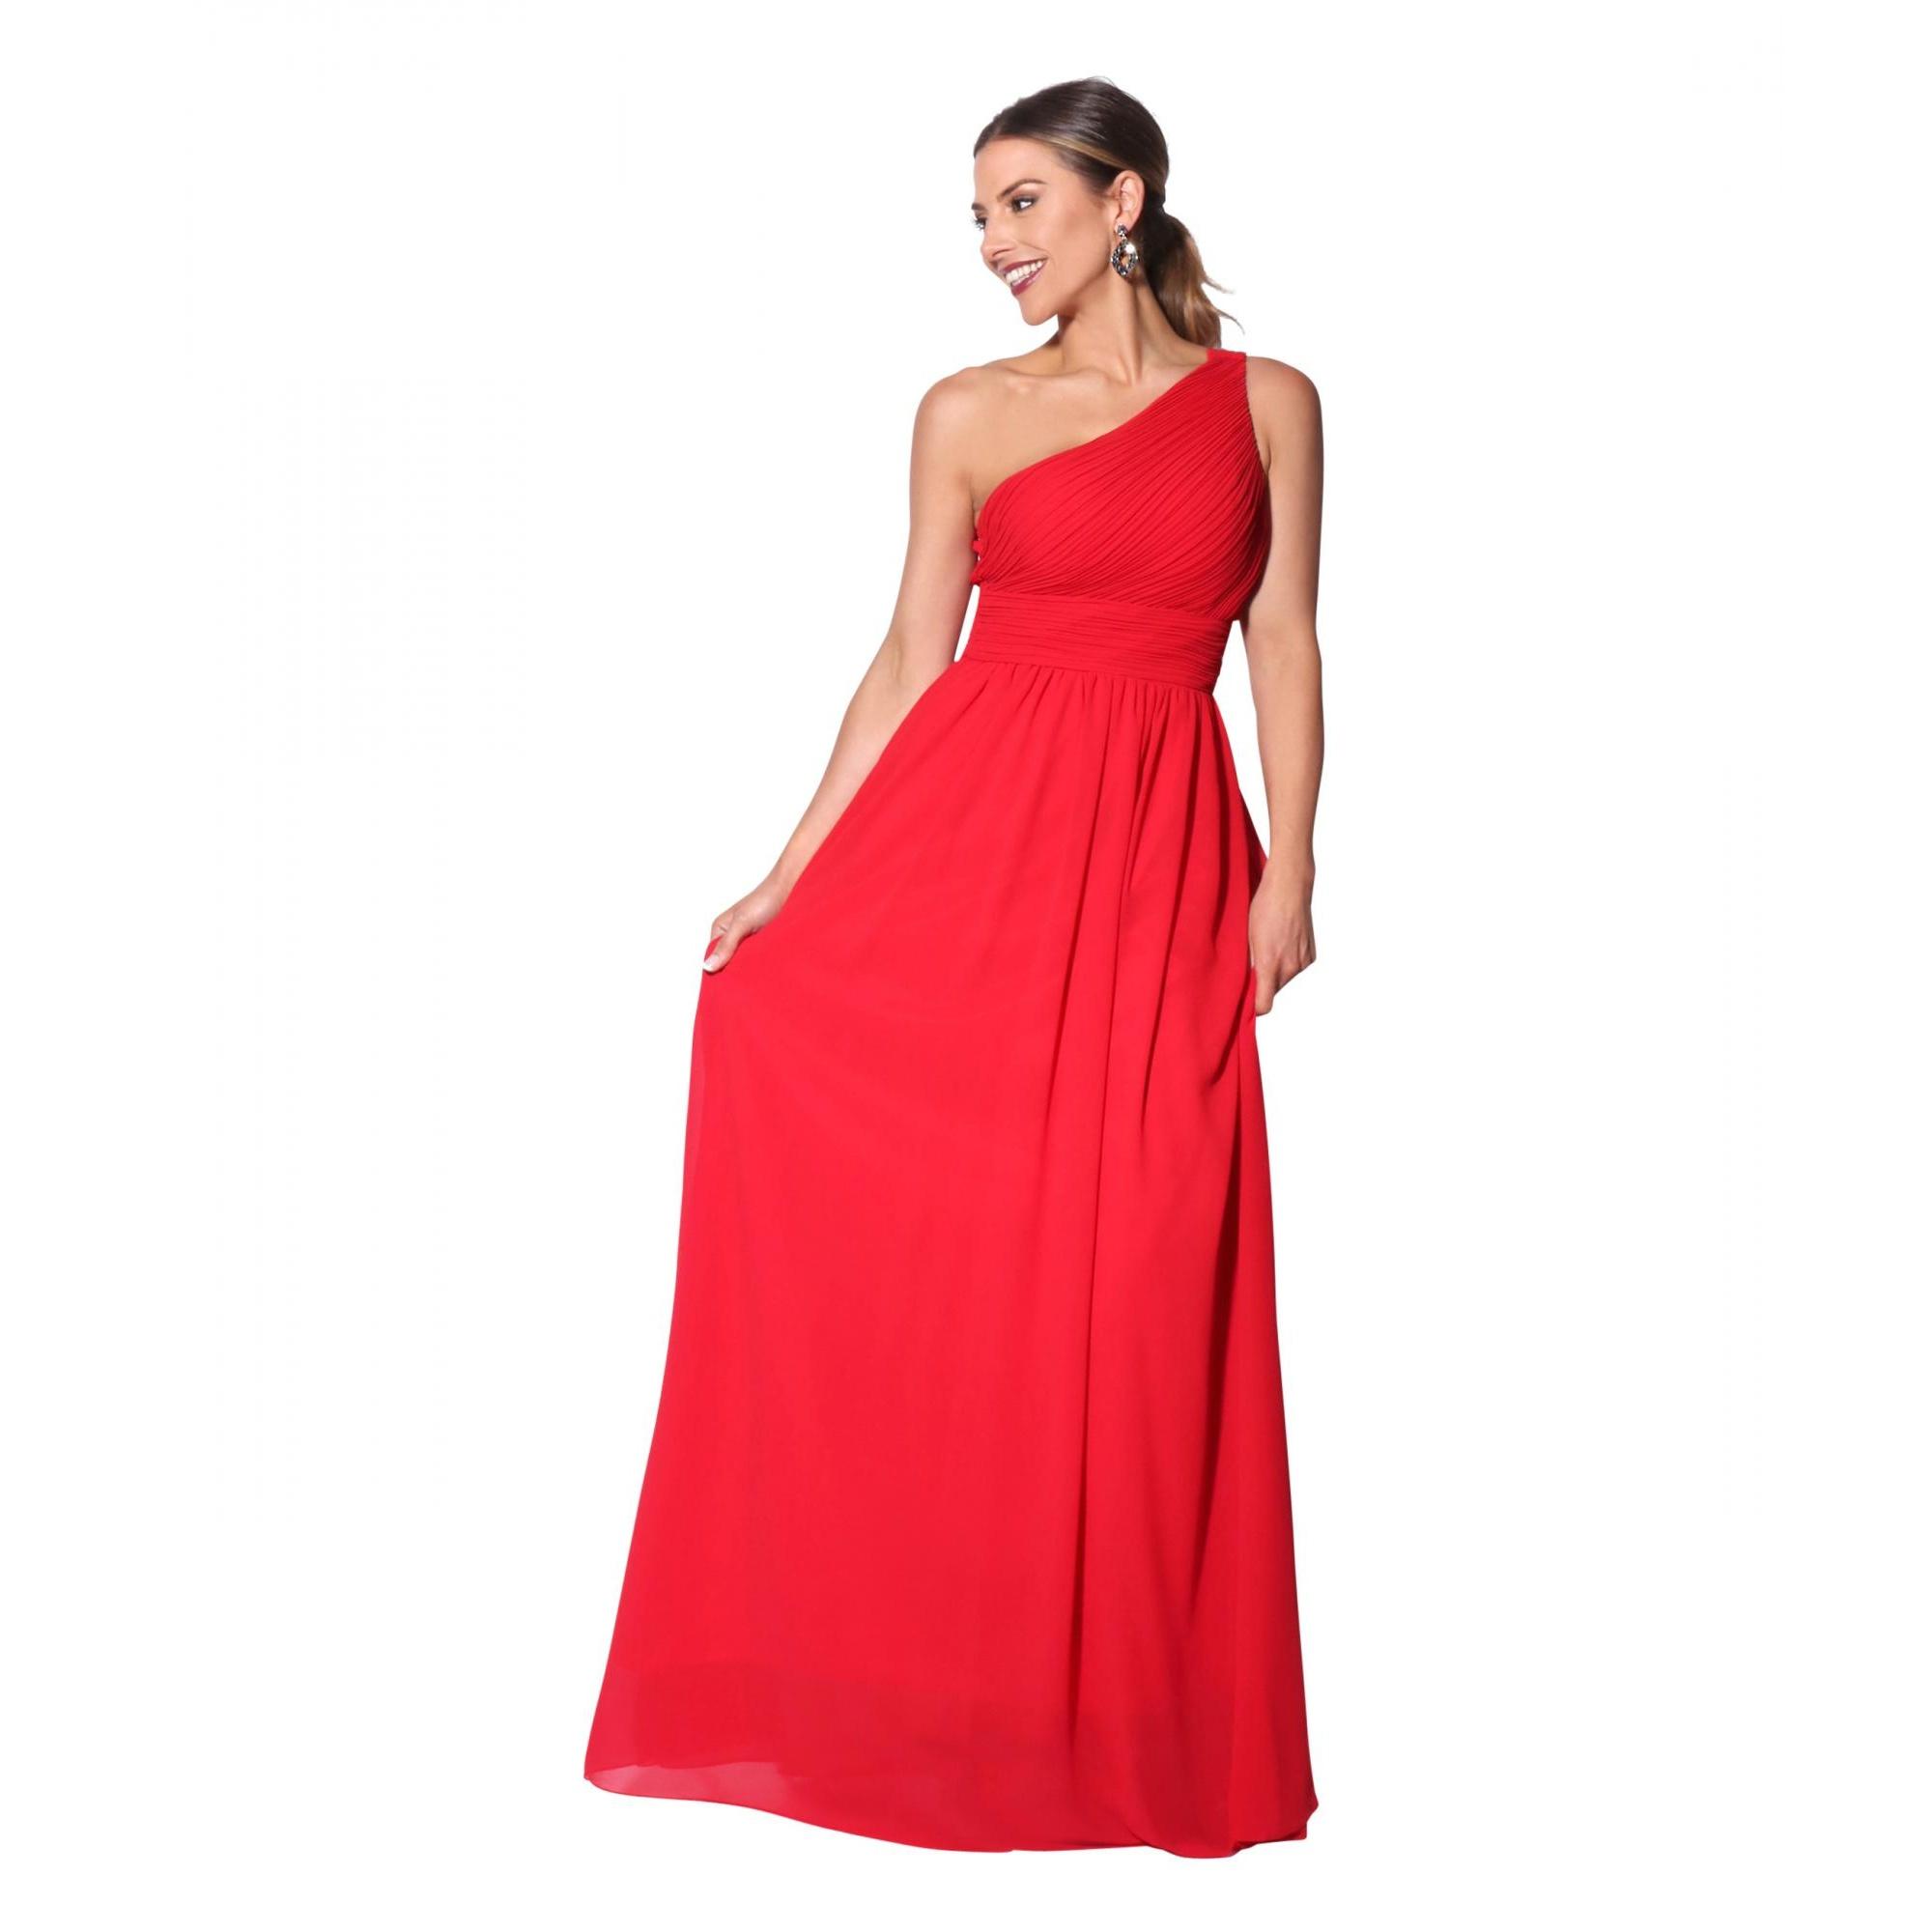 Krisp Womens/Ladies One Shoulder Evening Maxi Dress (10 UK) (Red)